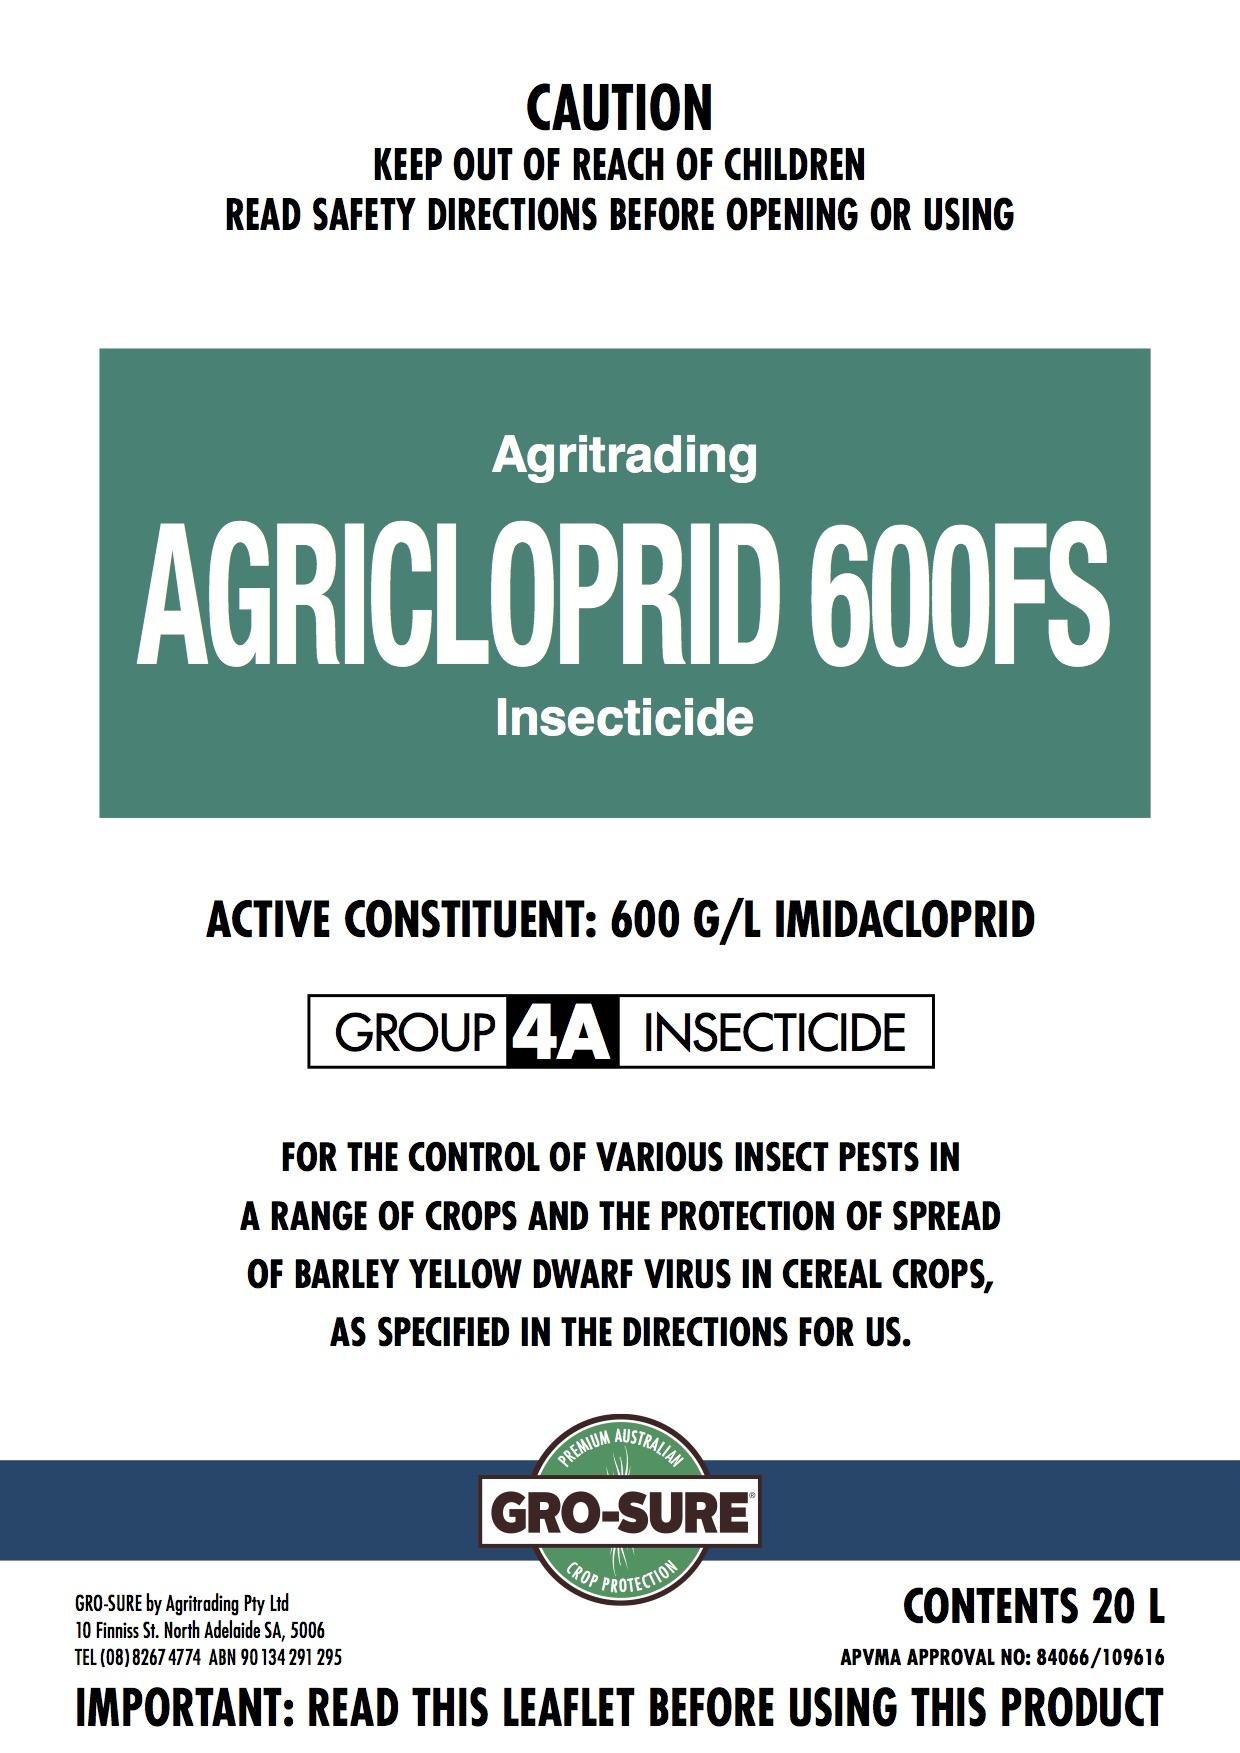 Agricloprid Web Label copy.jpg